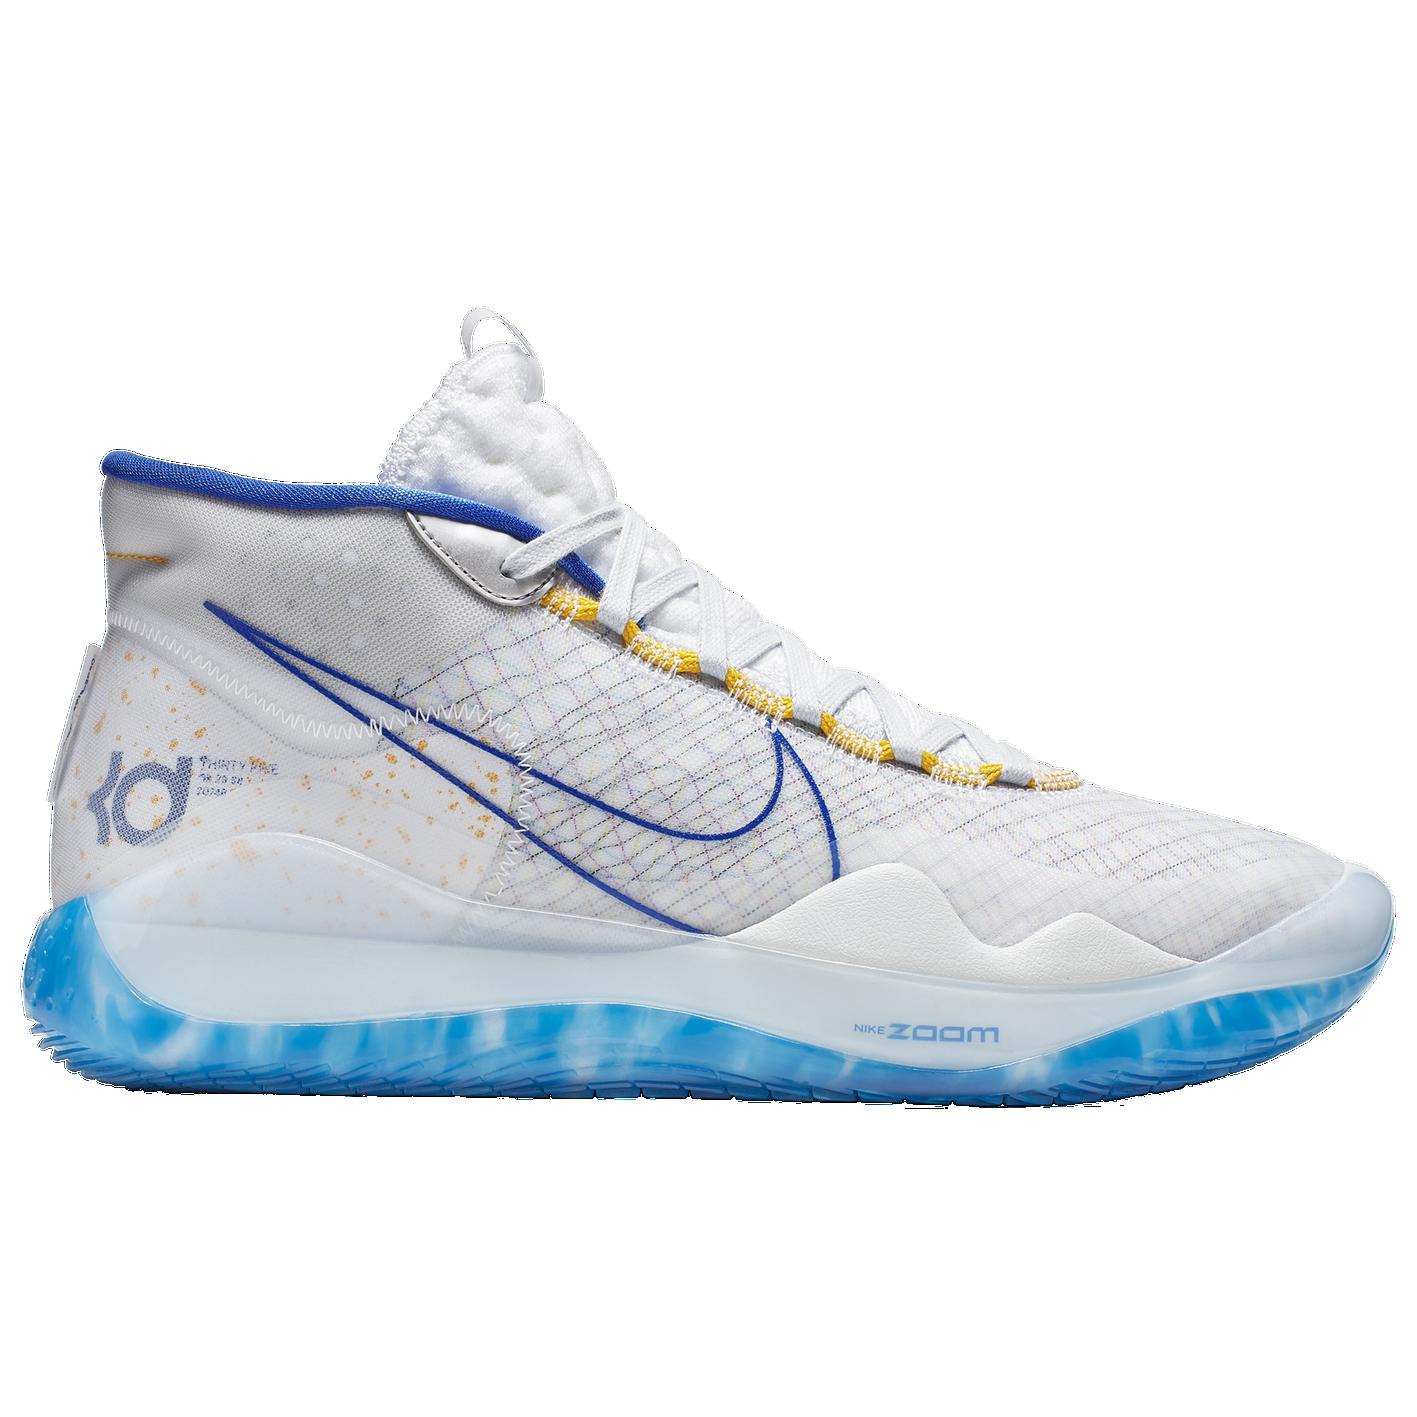 Zoom Kd12 Boys' Shoes Basketball Durant Nike School Grade 0wmNn8